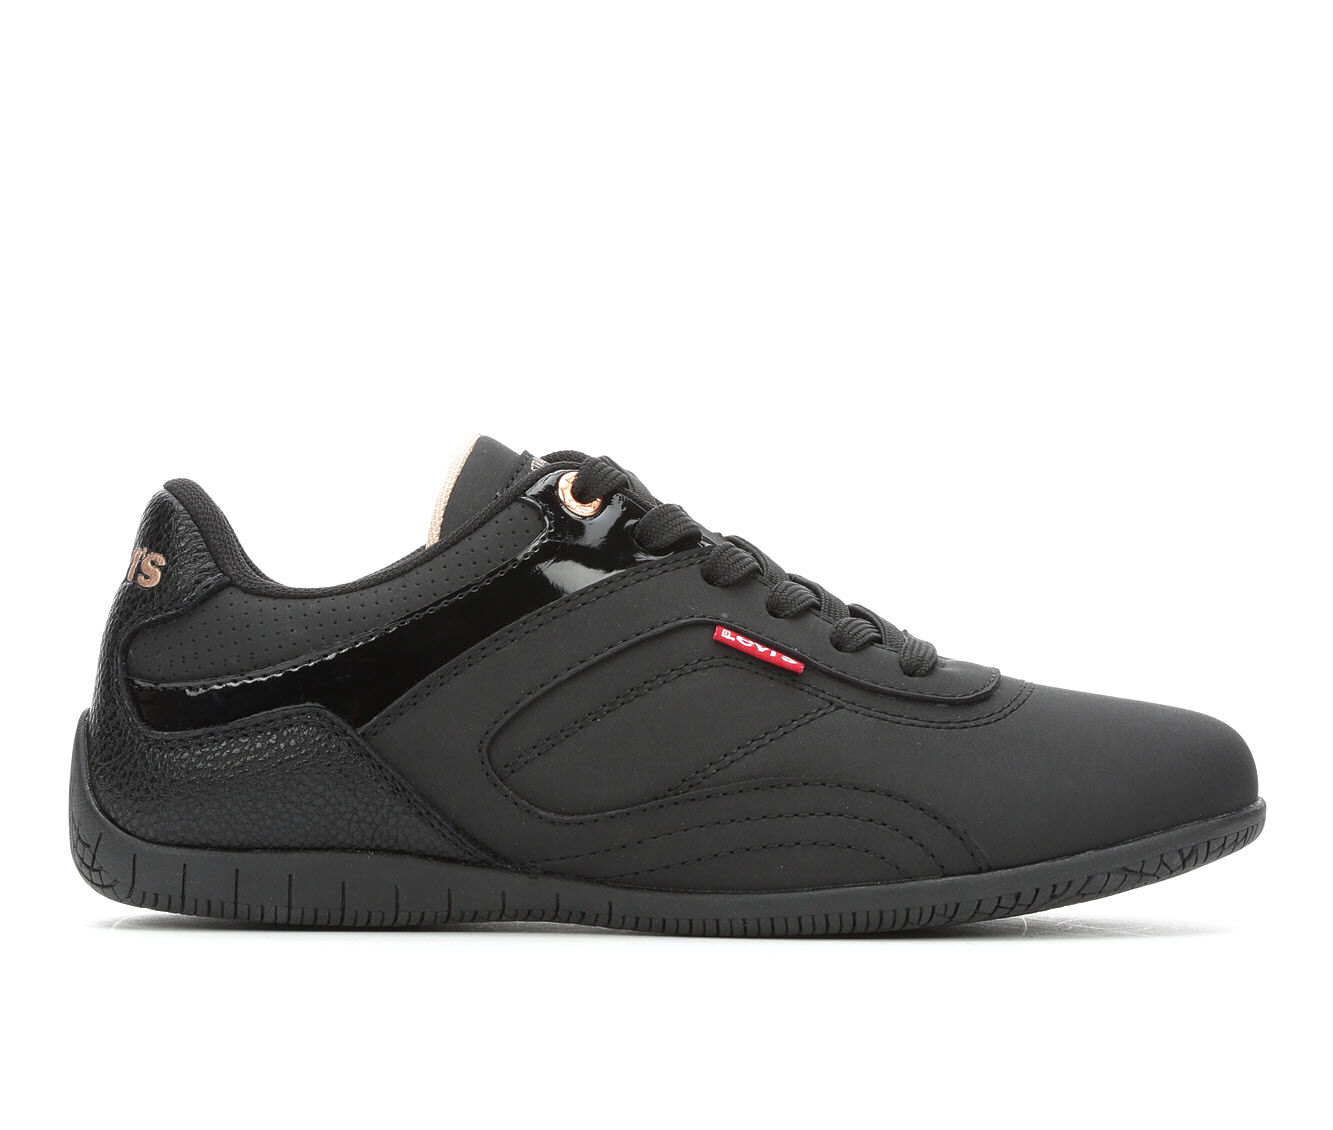 Women's Levis Stella UL Sneakers Blk Mono/Blush